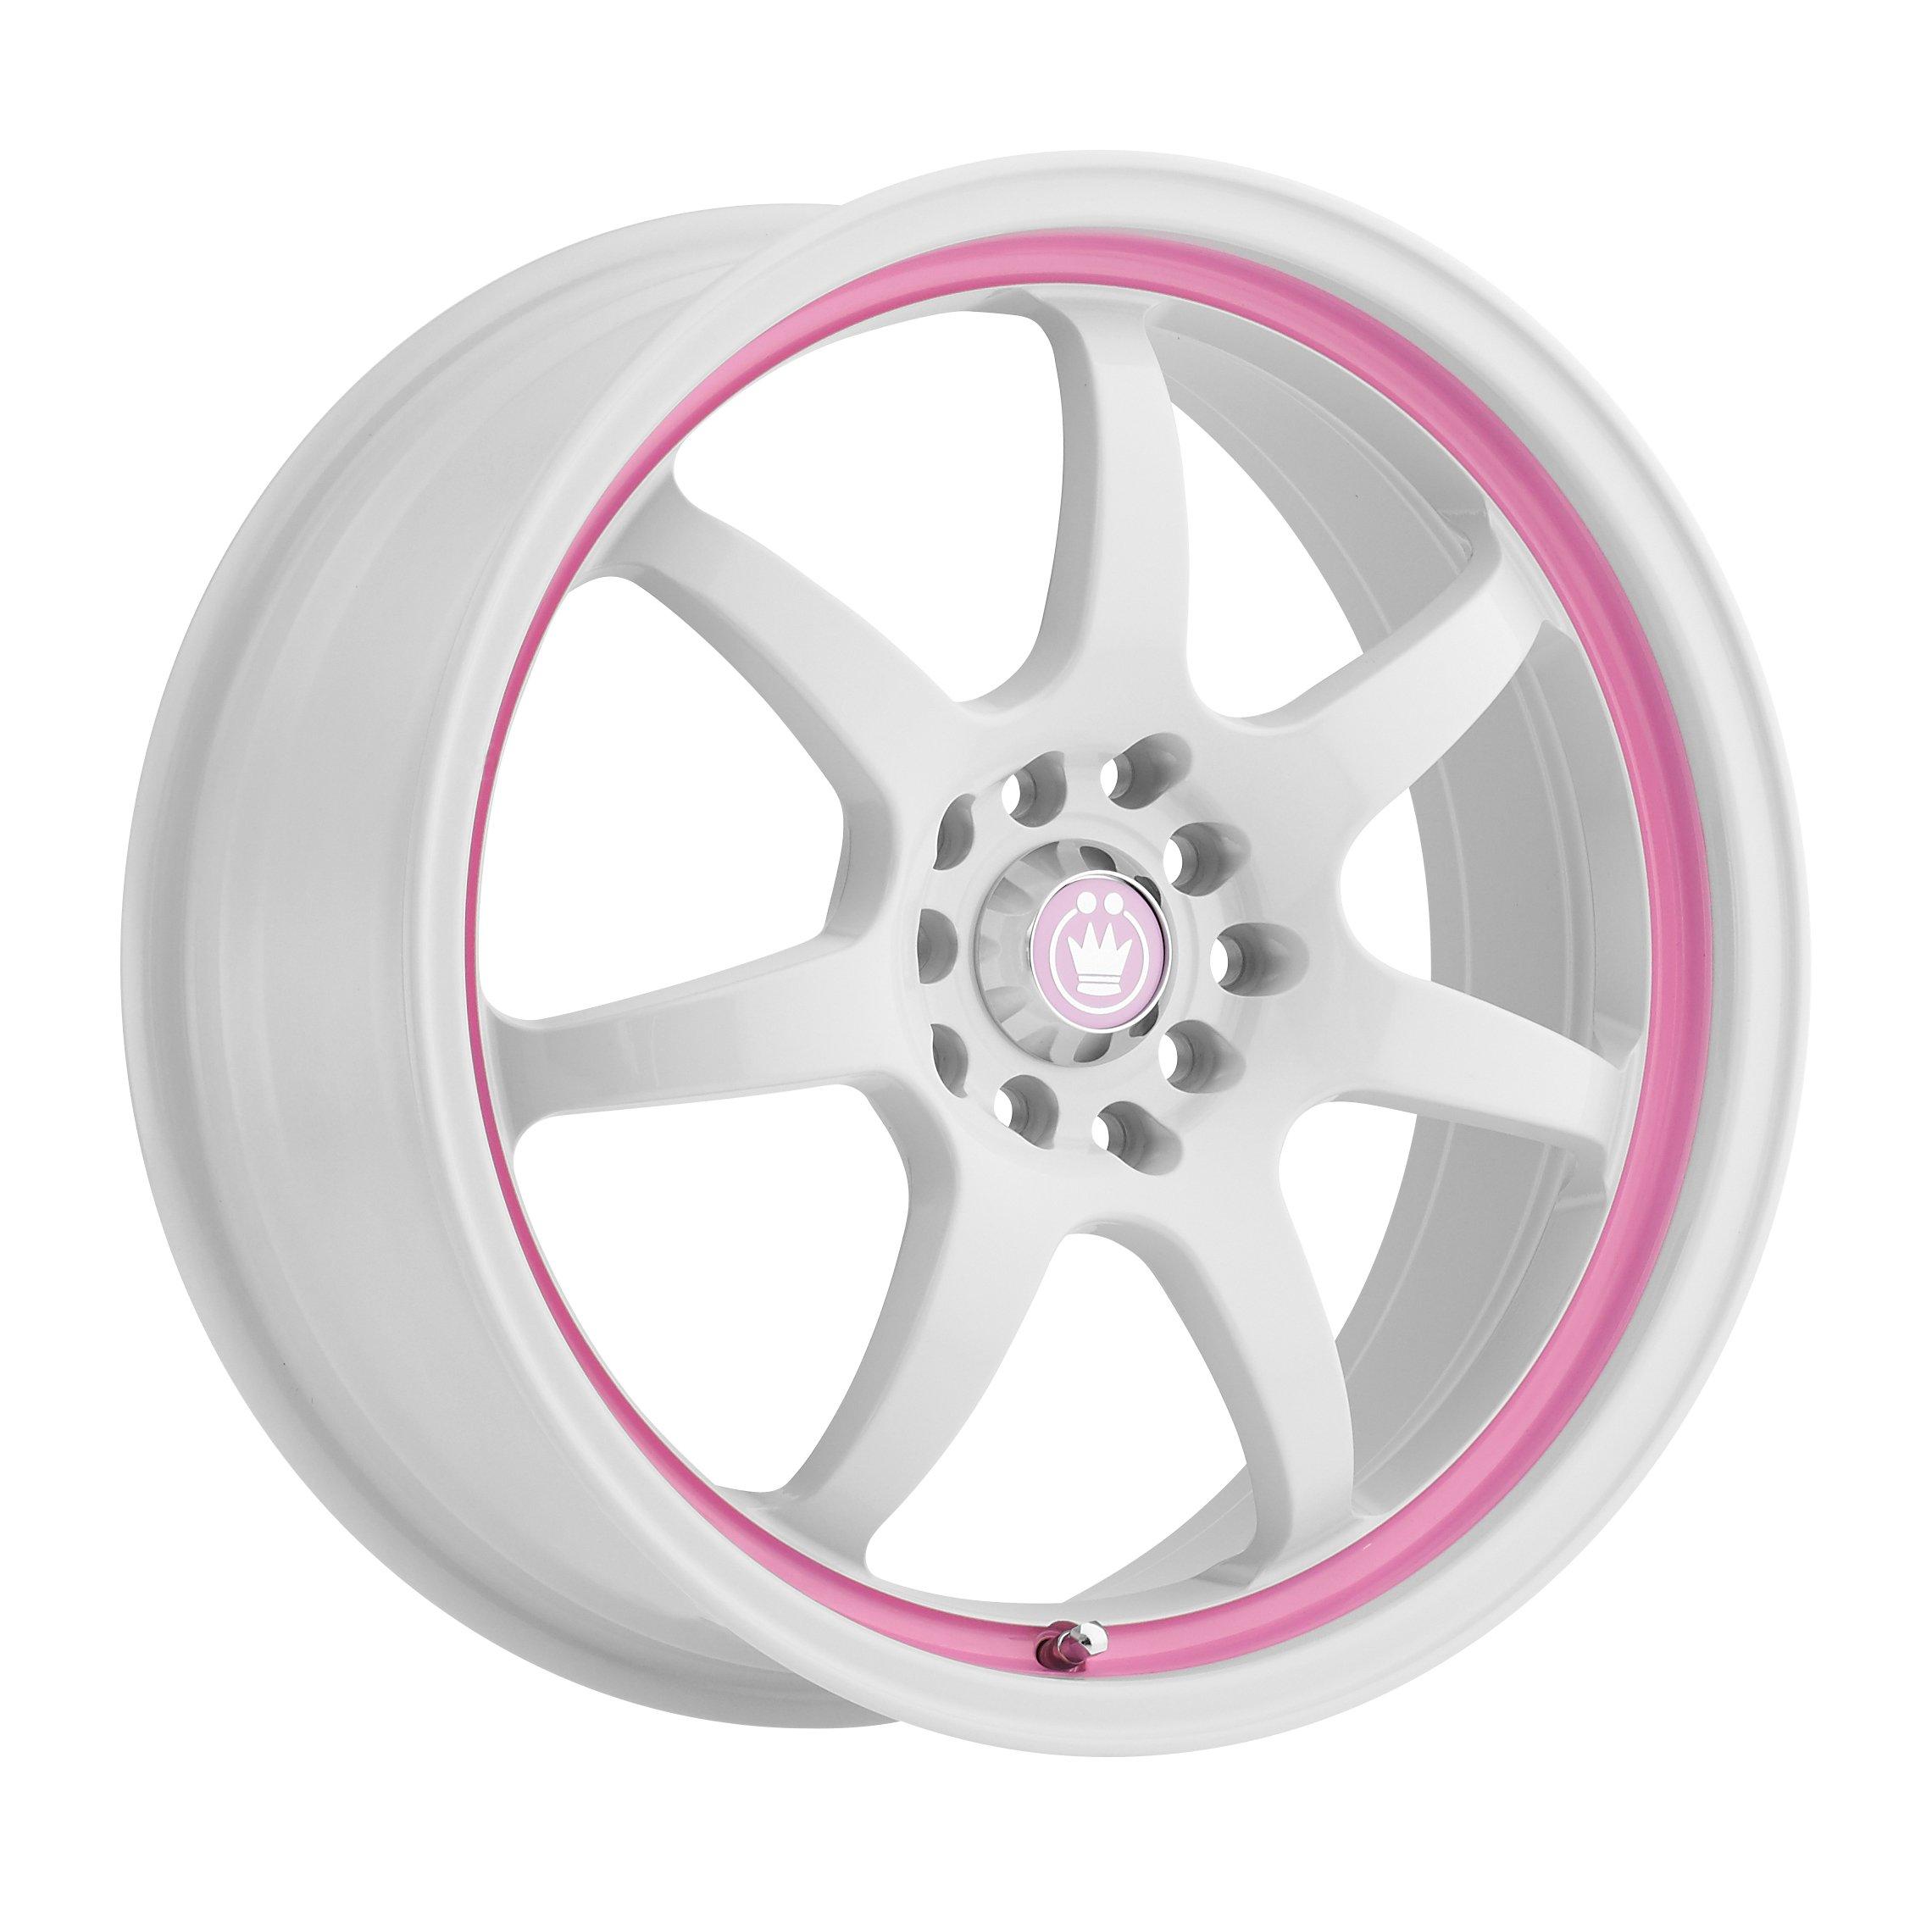 Konig-Forward-White-with-Pink-Stripe-Wheel-17x75x100mm